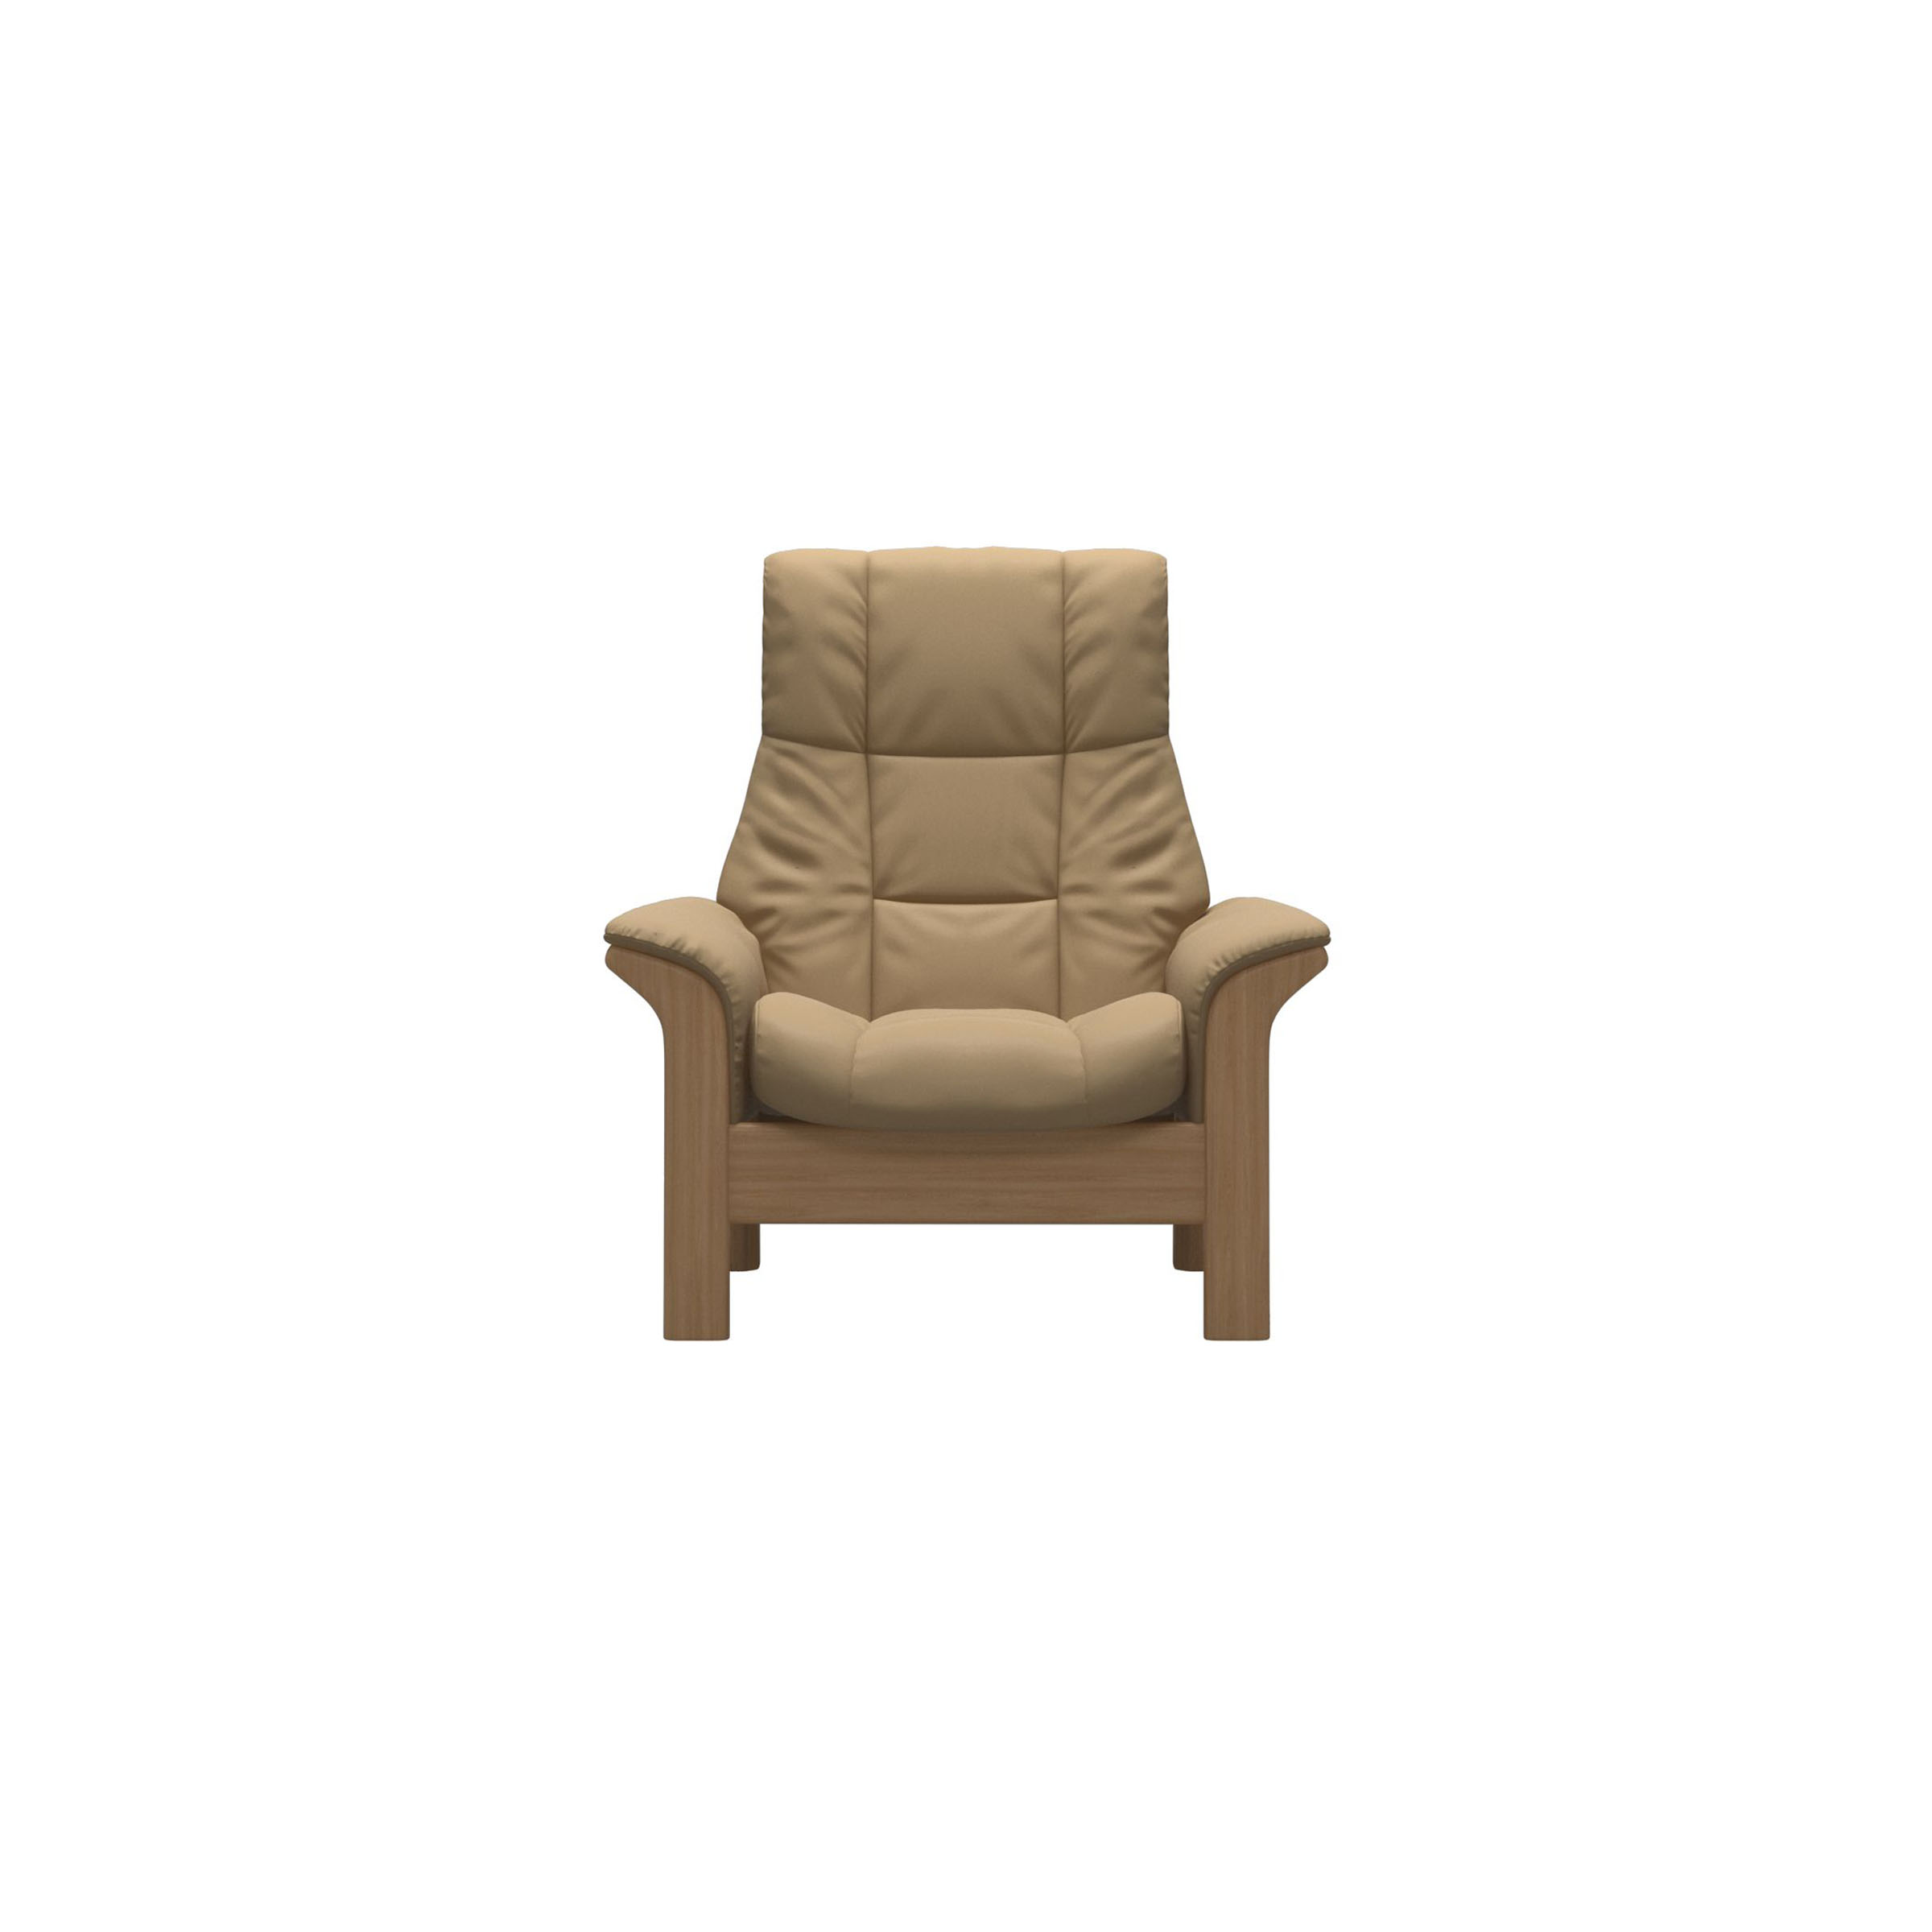 Stressless Windsor High Back Chair Paloma Sand/Oak